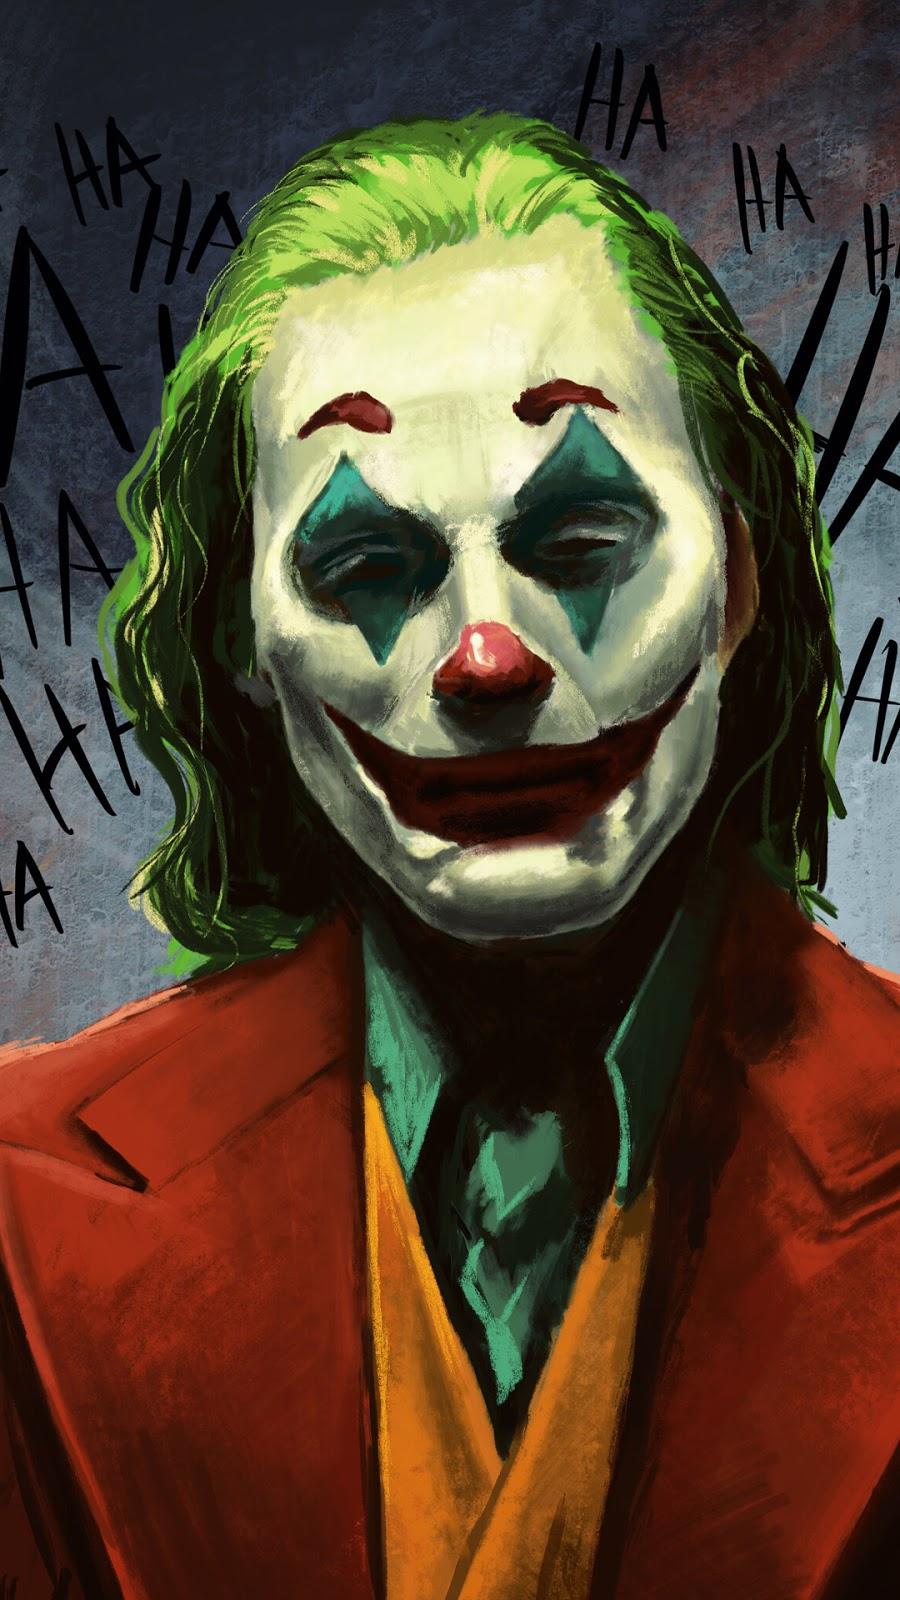 A WALLPAPER OF JOKER LAUGHING ART HD FREE DOWNLOAD 1080X1920